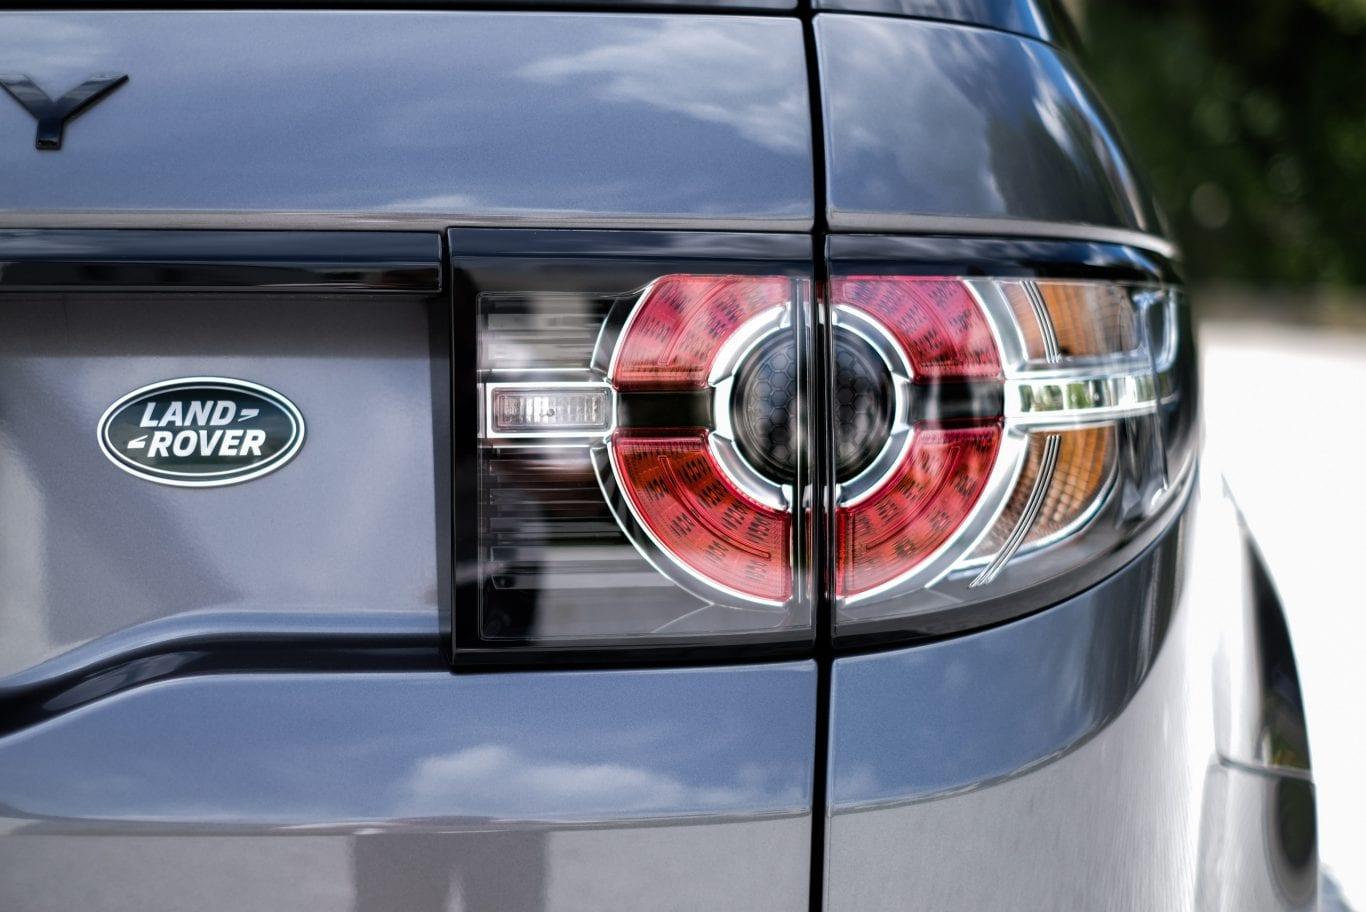 Sonderverkauf verlängert bis 06.08.2020 - Auto Kunz AG 60